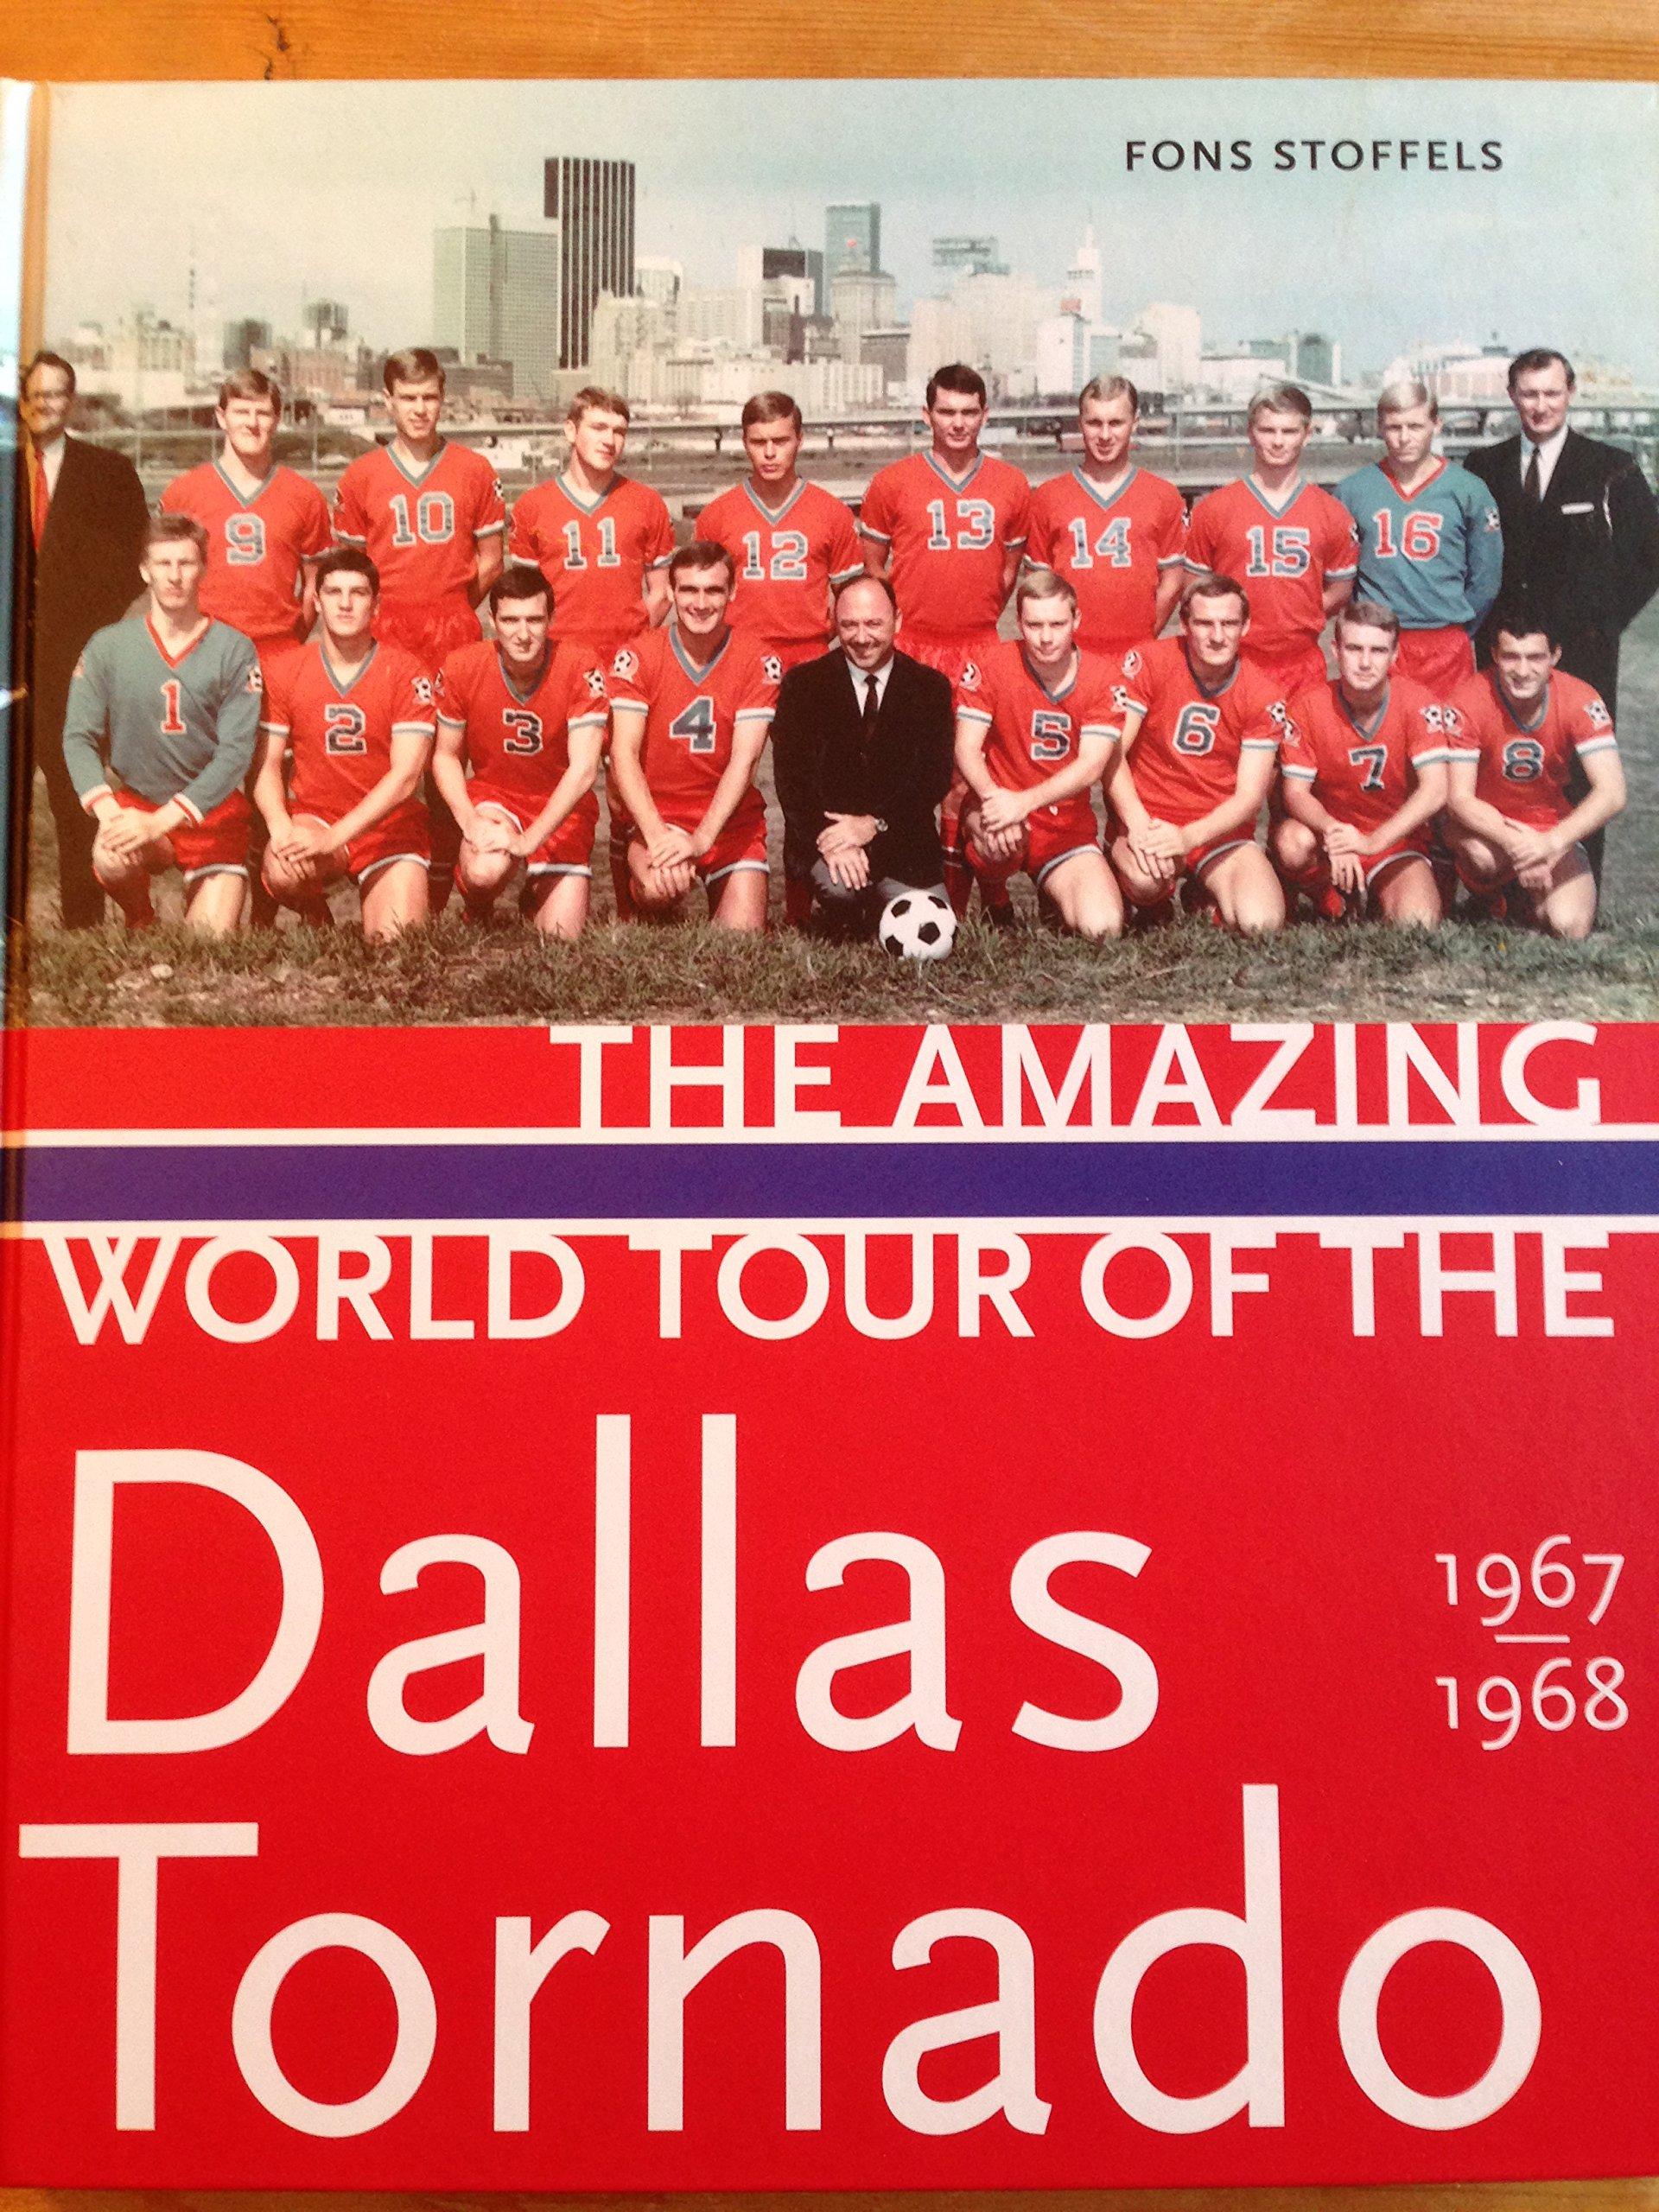 The Amazing World Tour of the Dallas Tornado